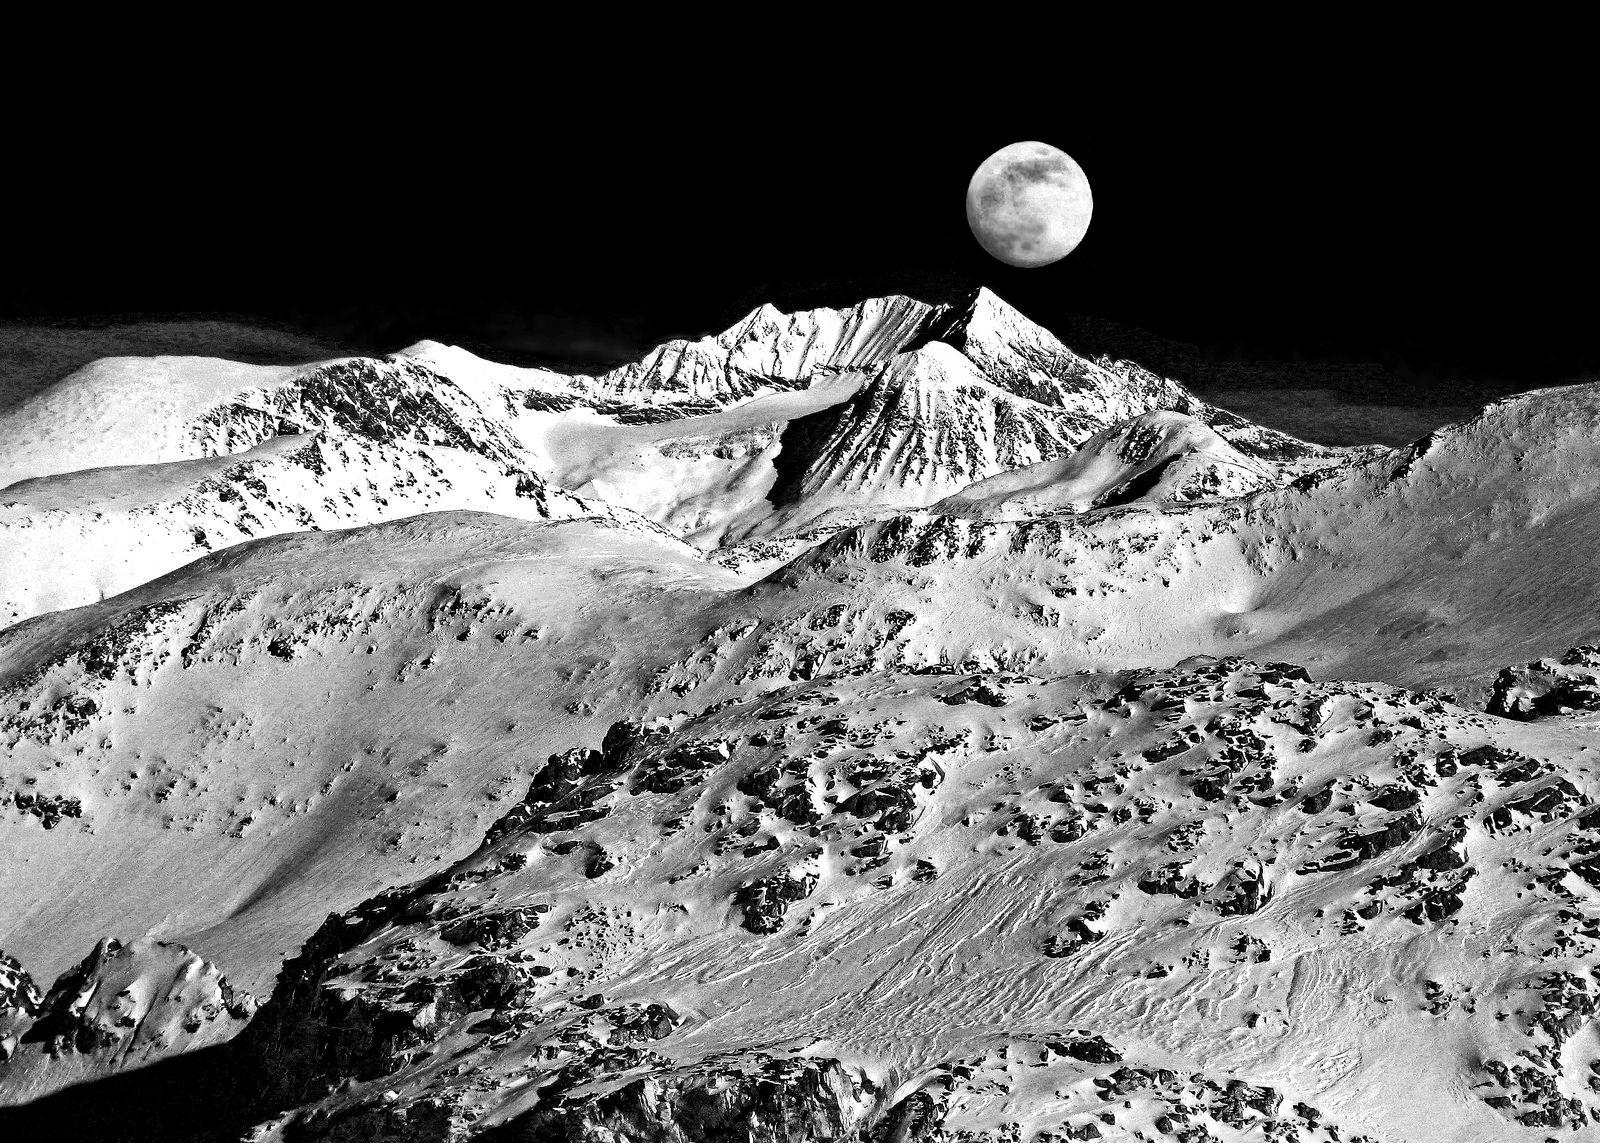 Mountain Moonscape b&w | by david schweitzer